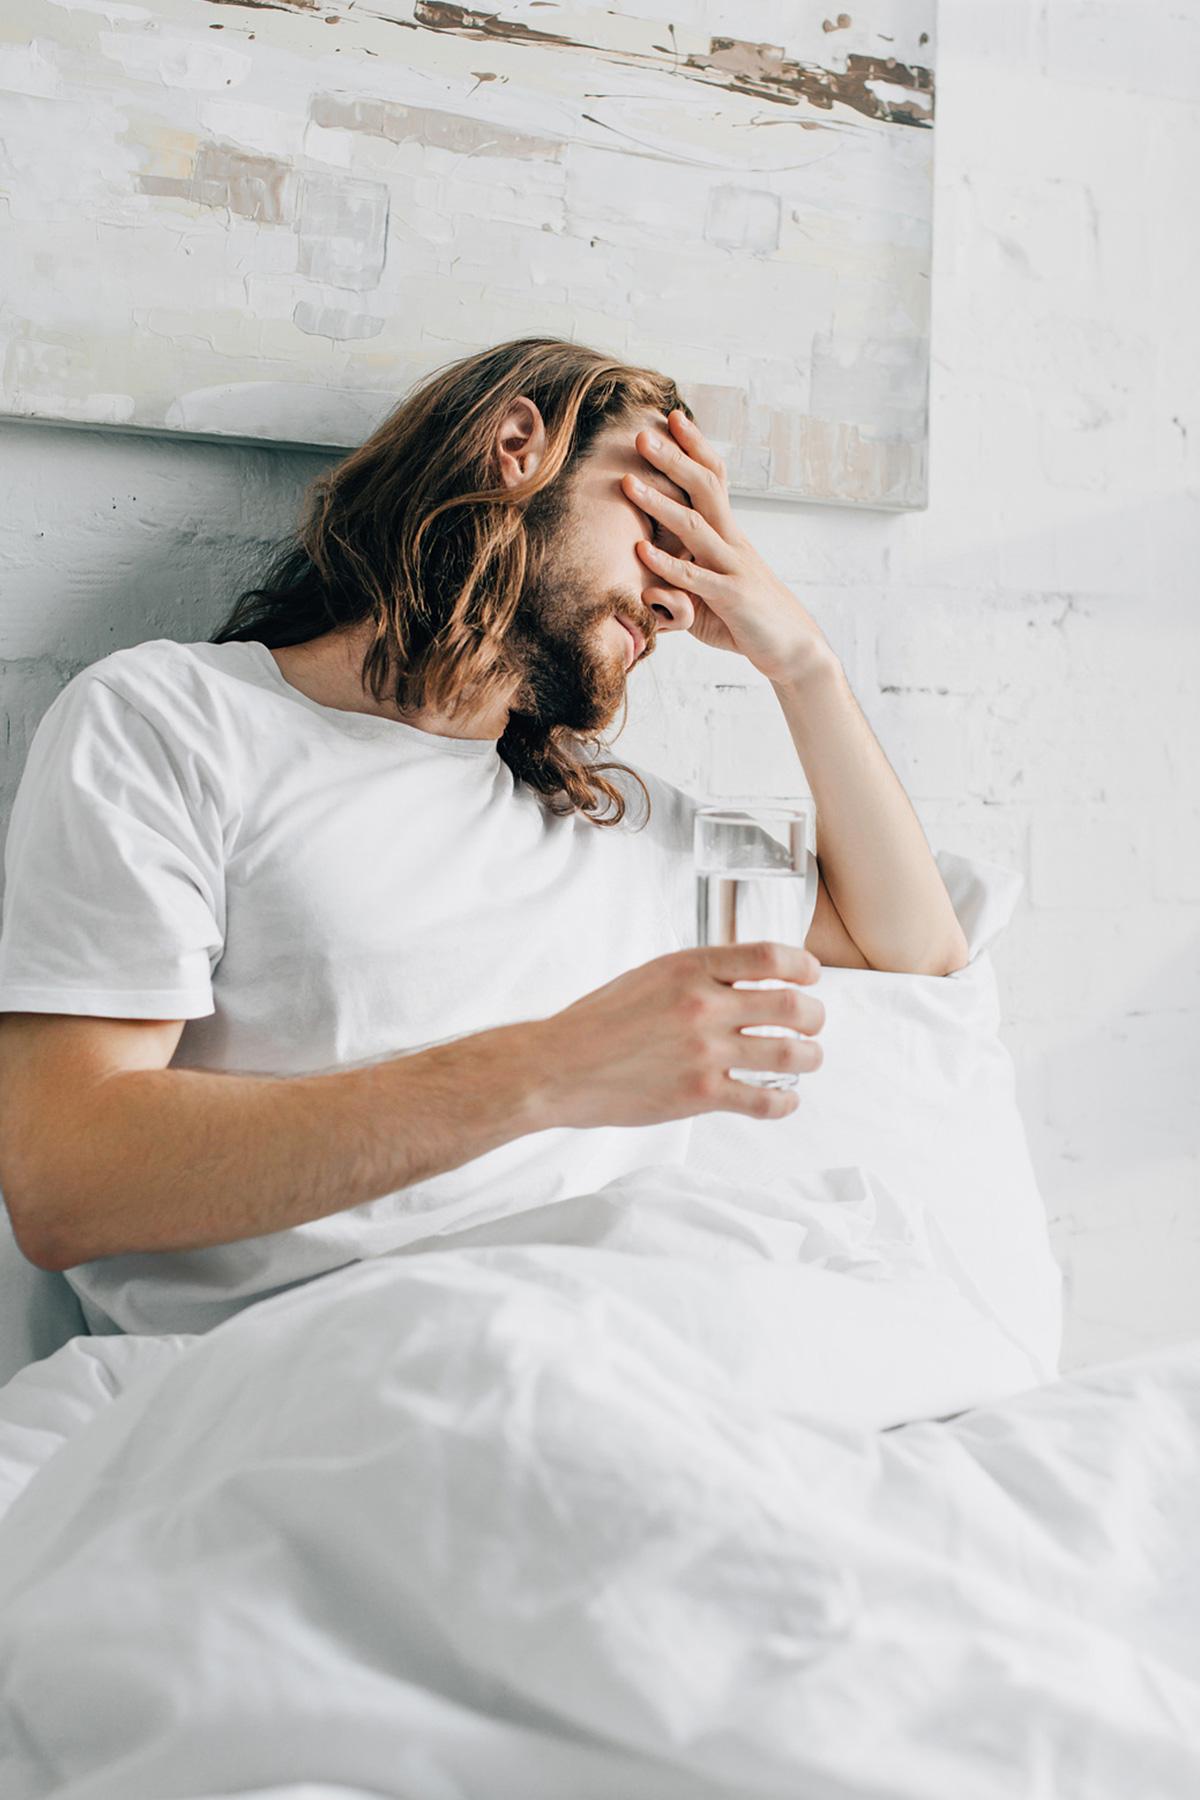 Mobile Hangover IV & Emergency Hangover Cure